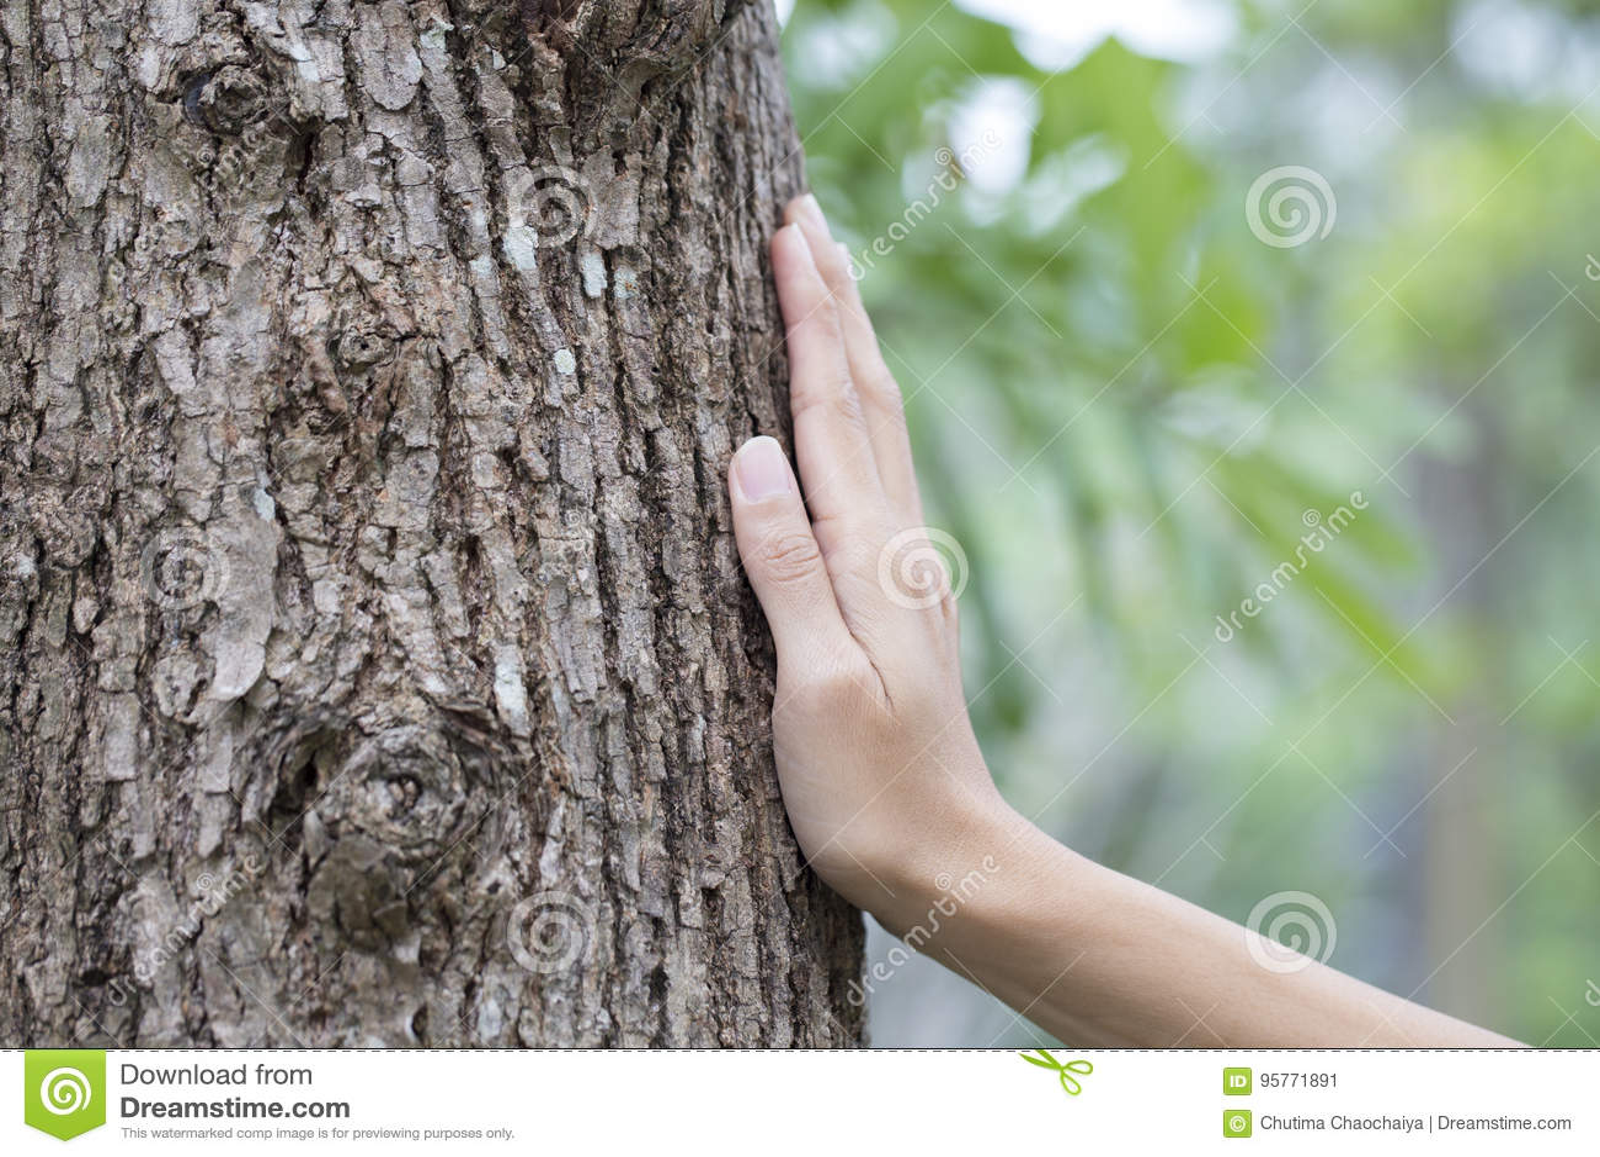 Woman hand touching tree trunk